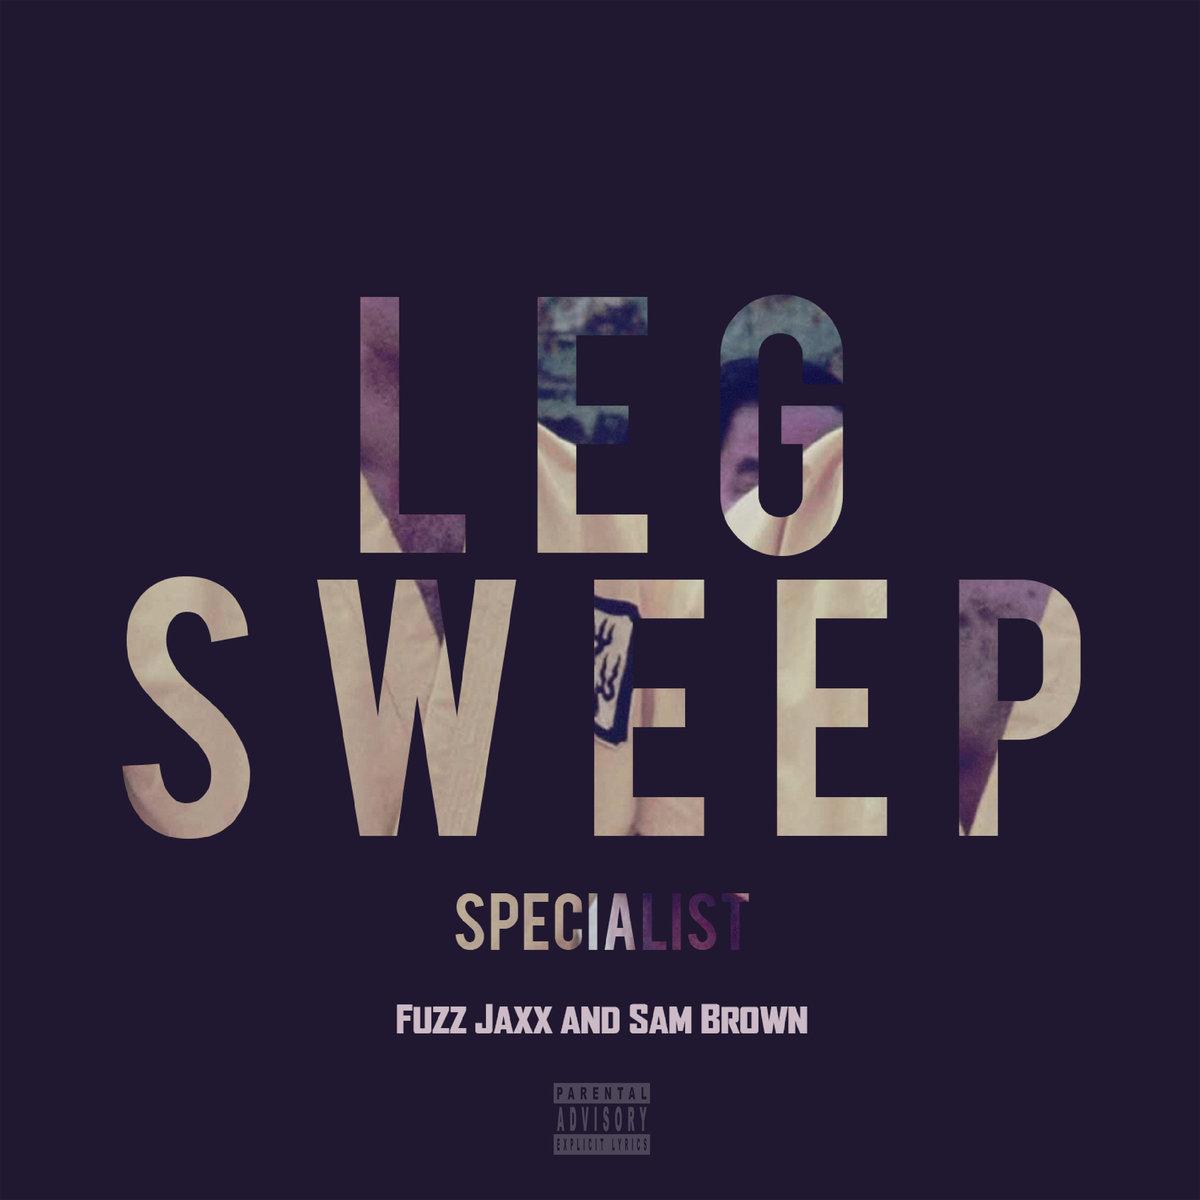 Legsweep_specialist_presenta_legsweep